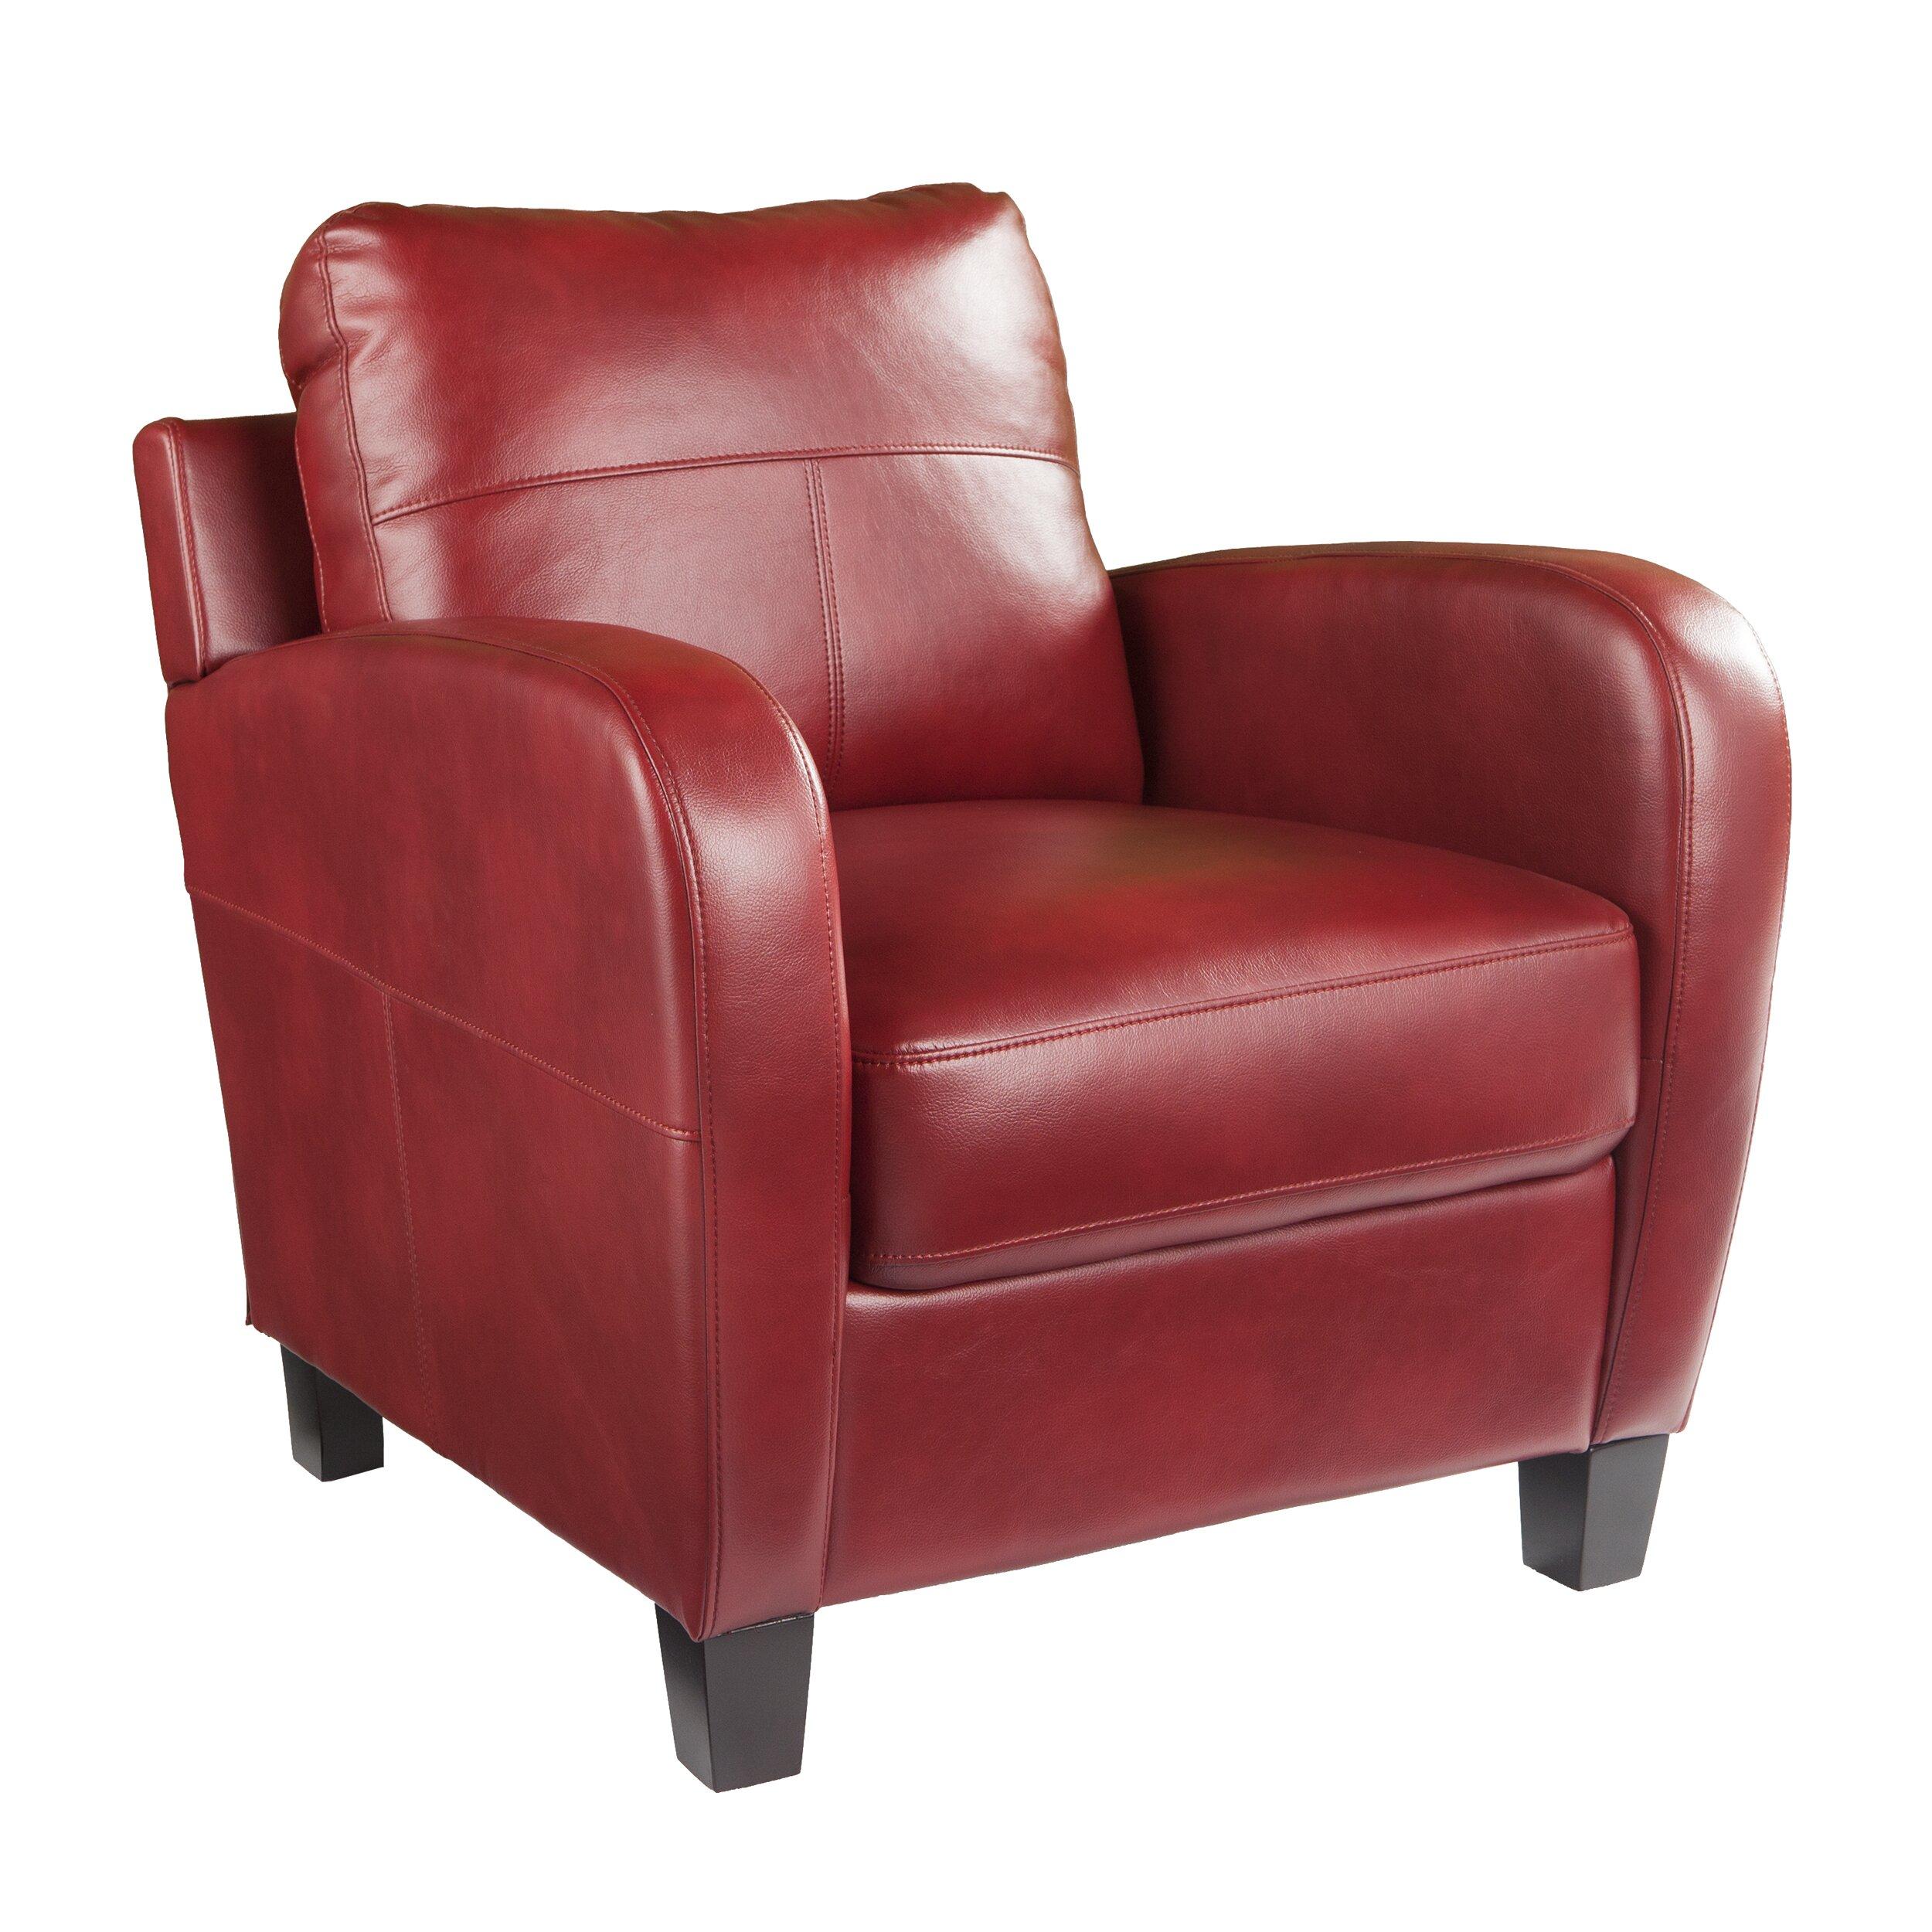 Brayden Studio East Clevedon Lounge Chair Amp Reviews